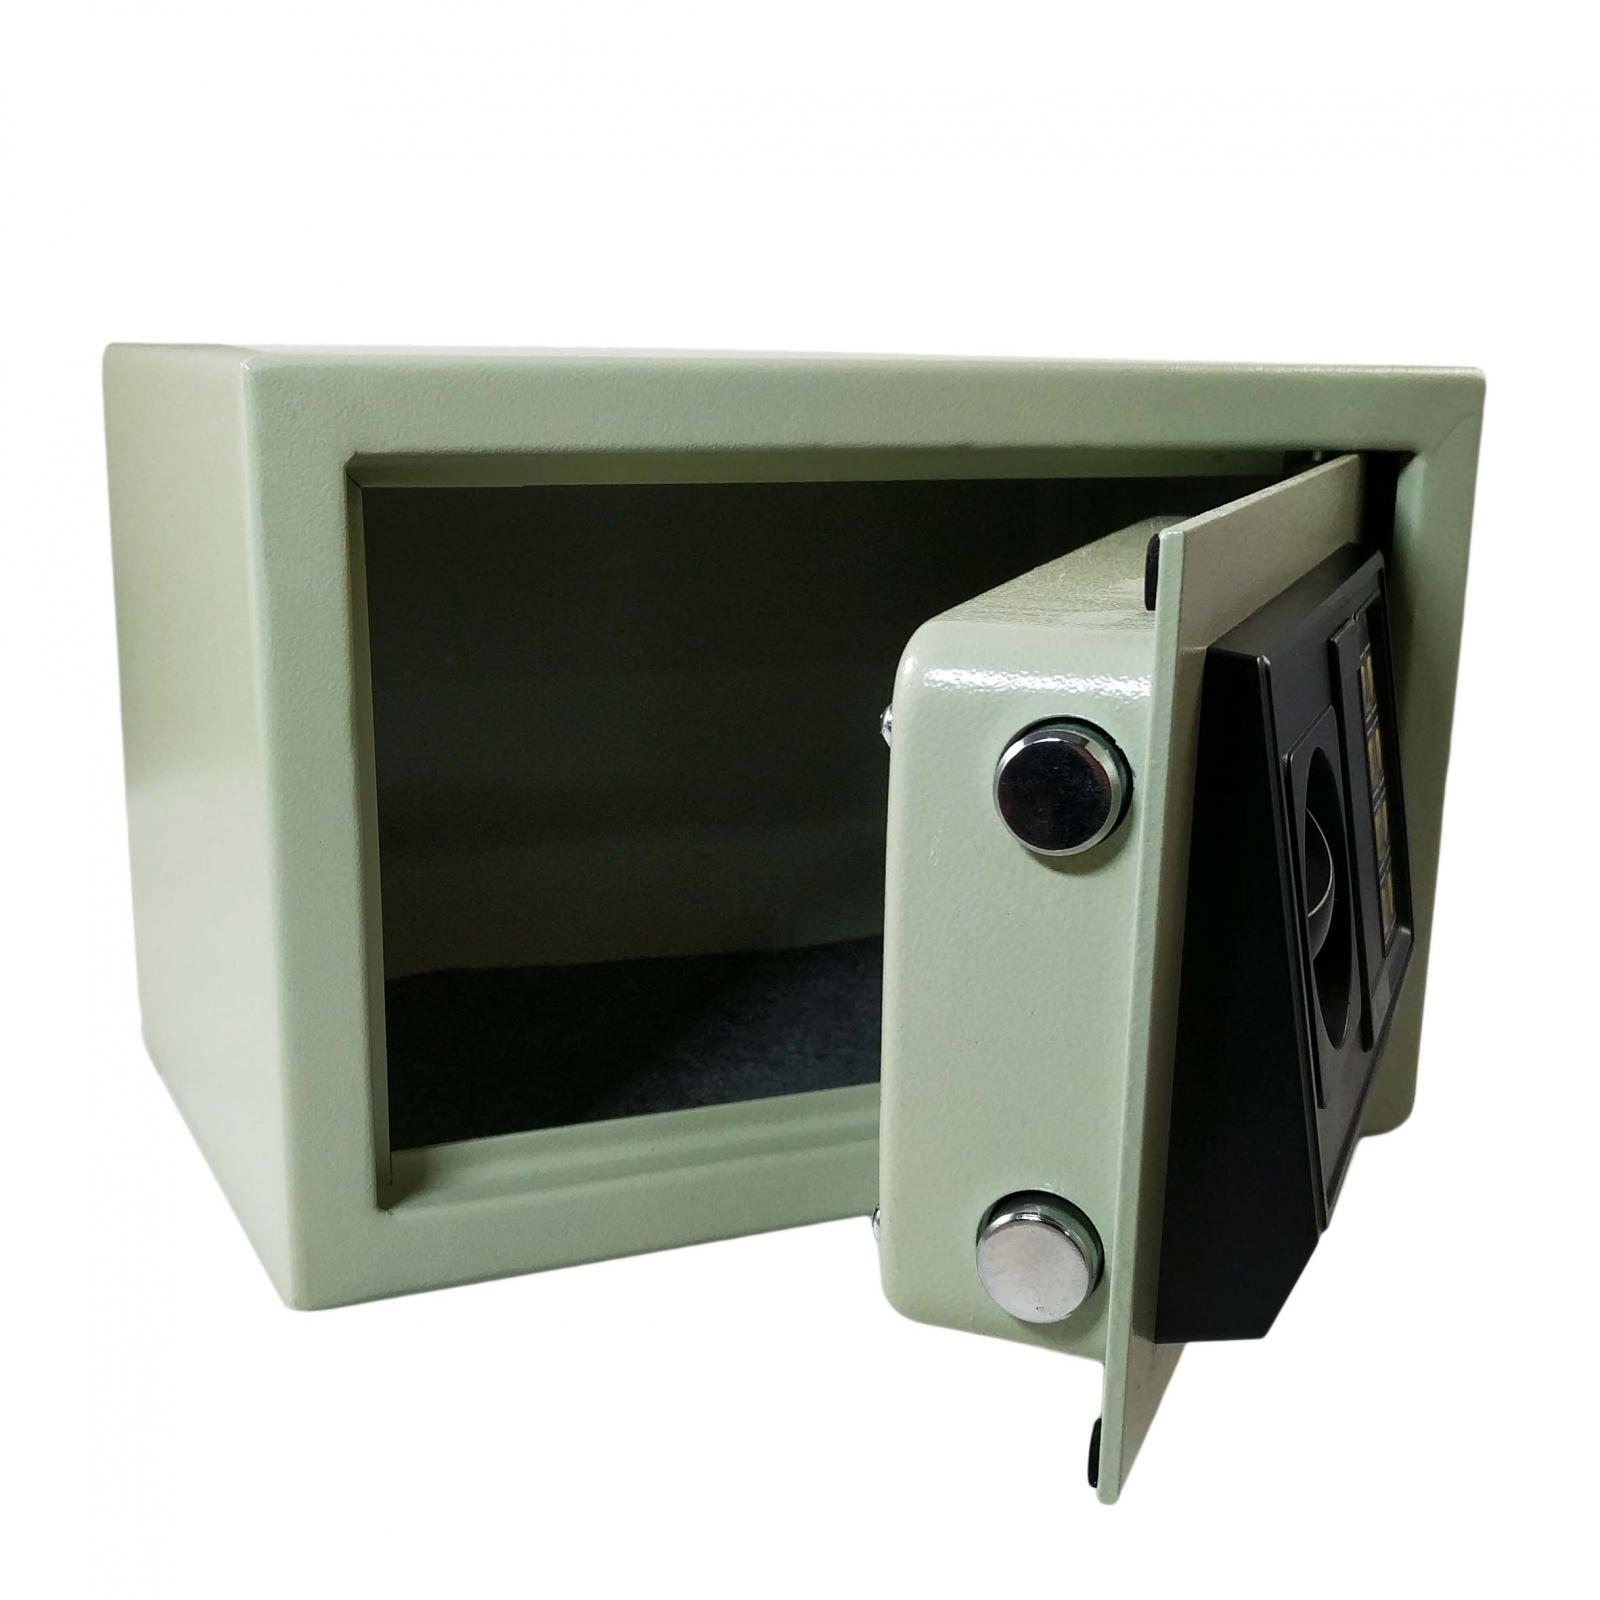 Security Digital Steel Wall Safe Box Large Electronic Keypad